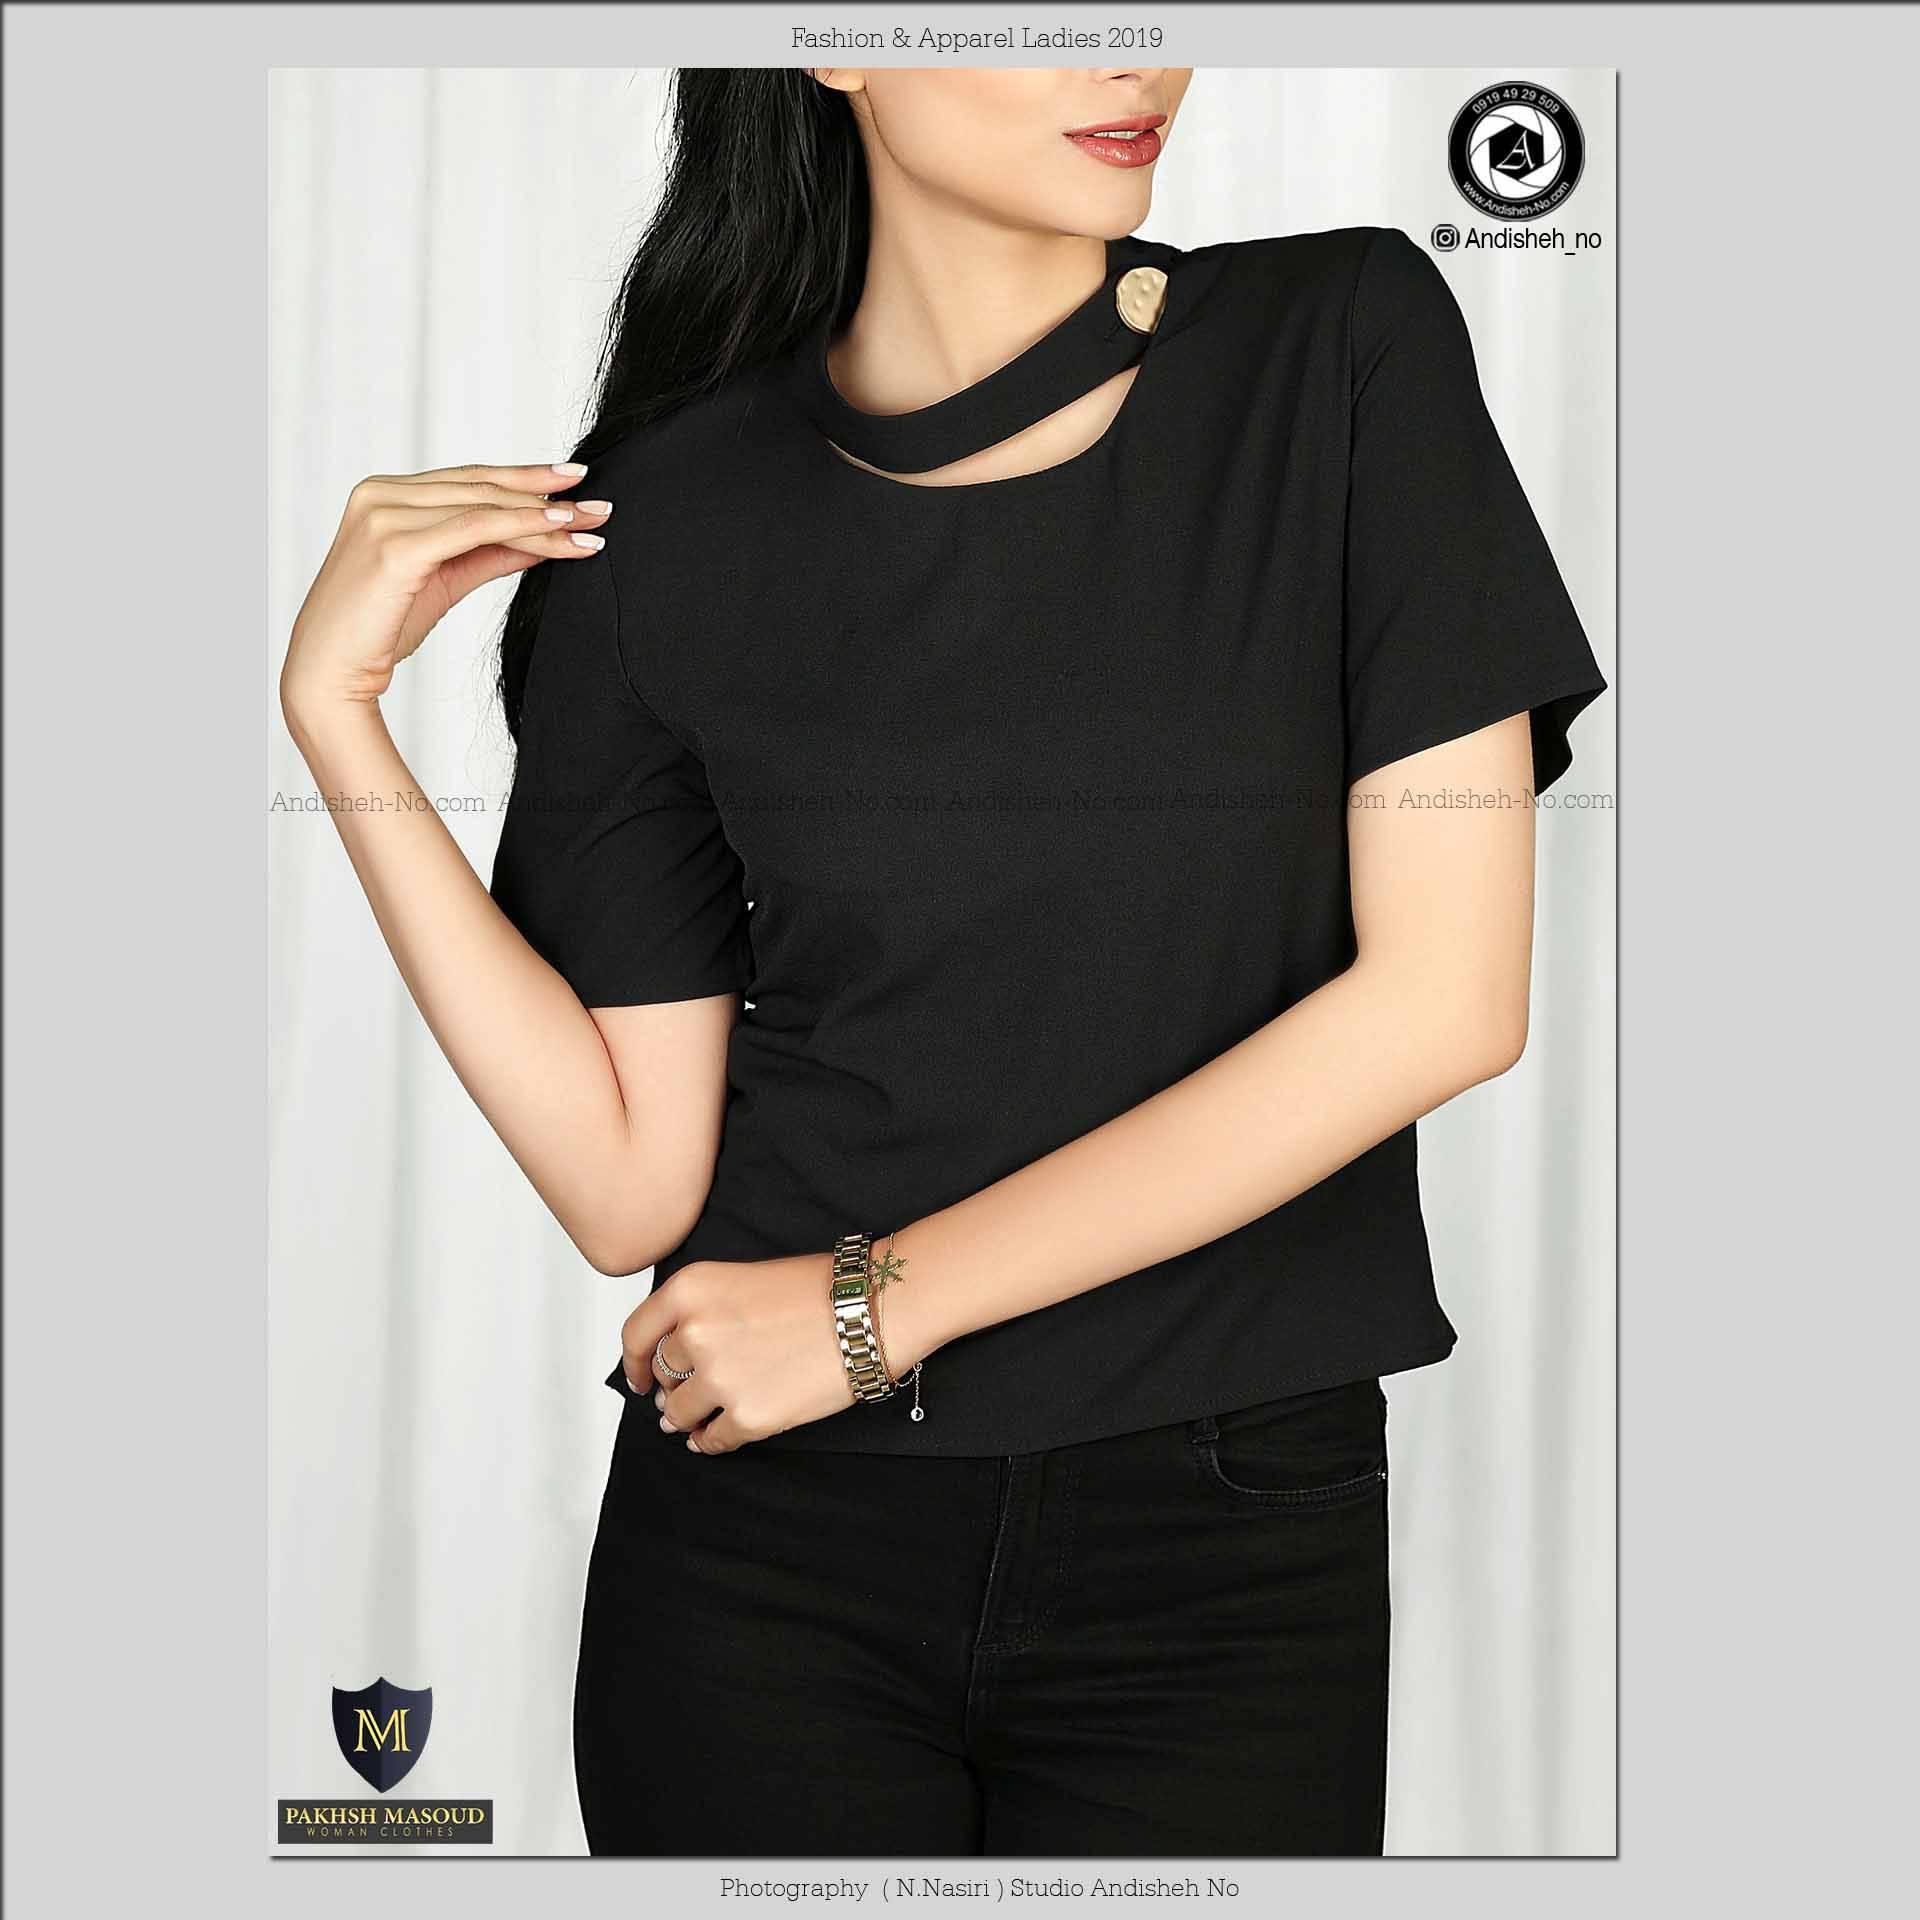 Clothing Modeling Clothing Photography andisheh no - nima nasiri - pakhsheh masoud - fashion 2019 - collection Apparel Ladies